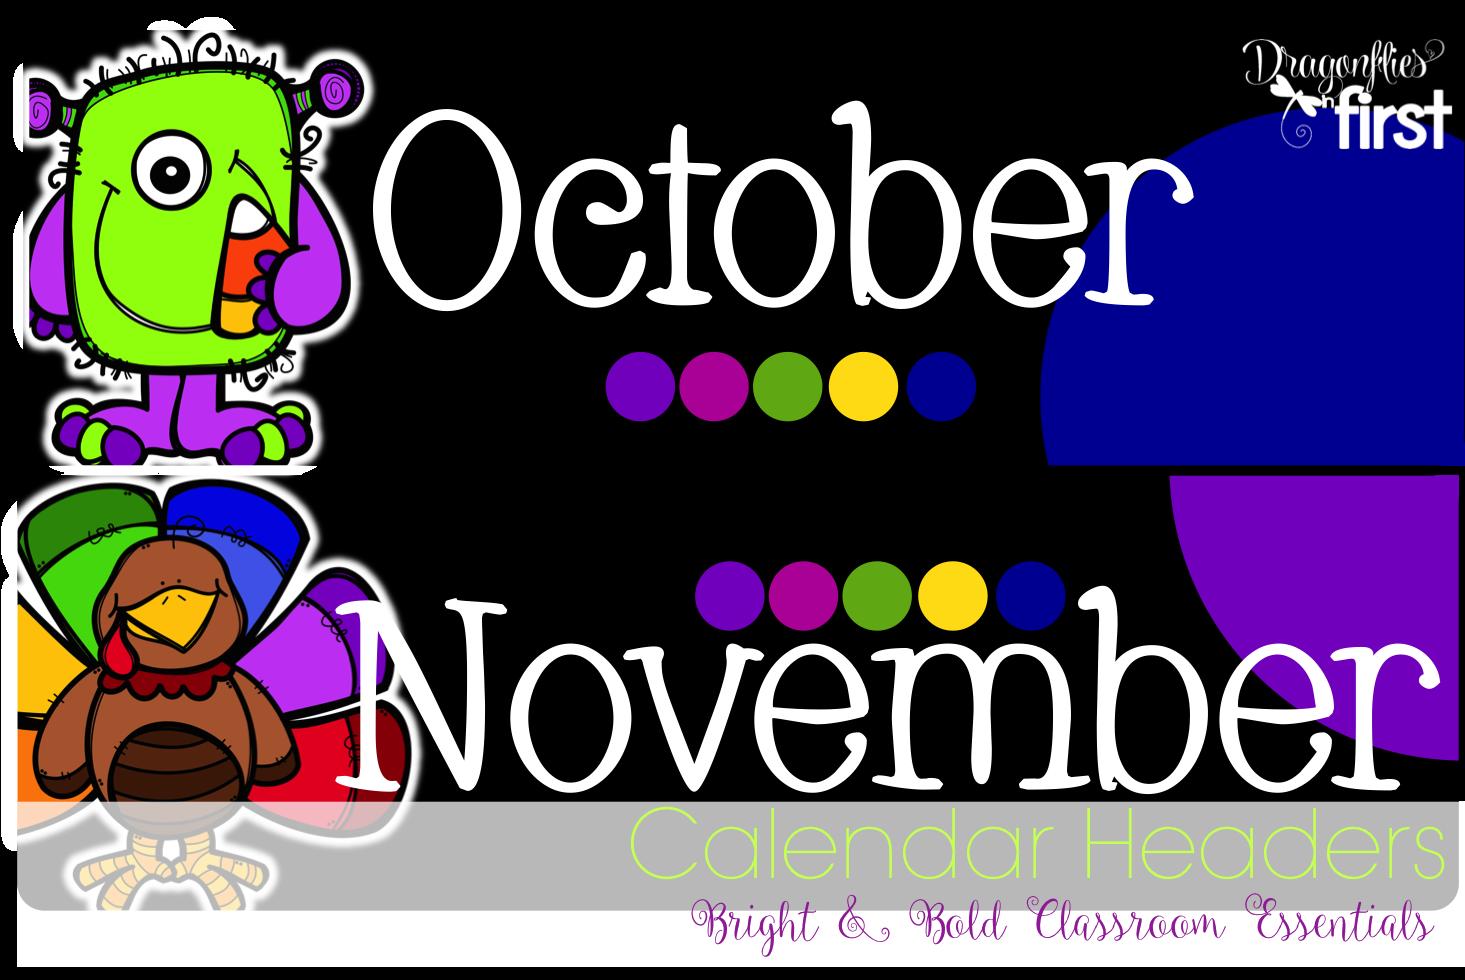 Calendar Monthly Headers : Classroom calendar decor